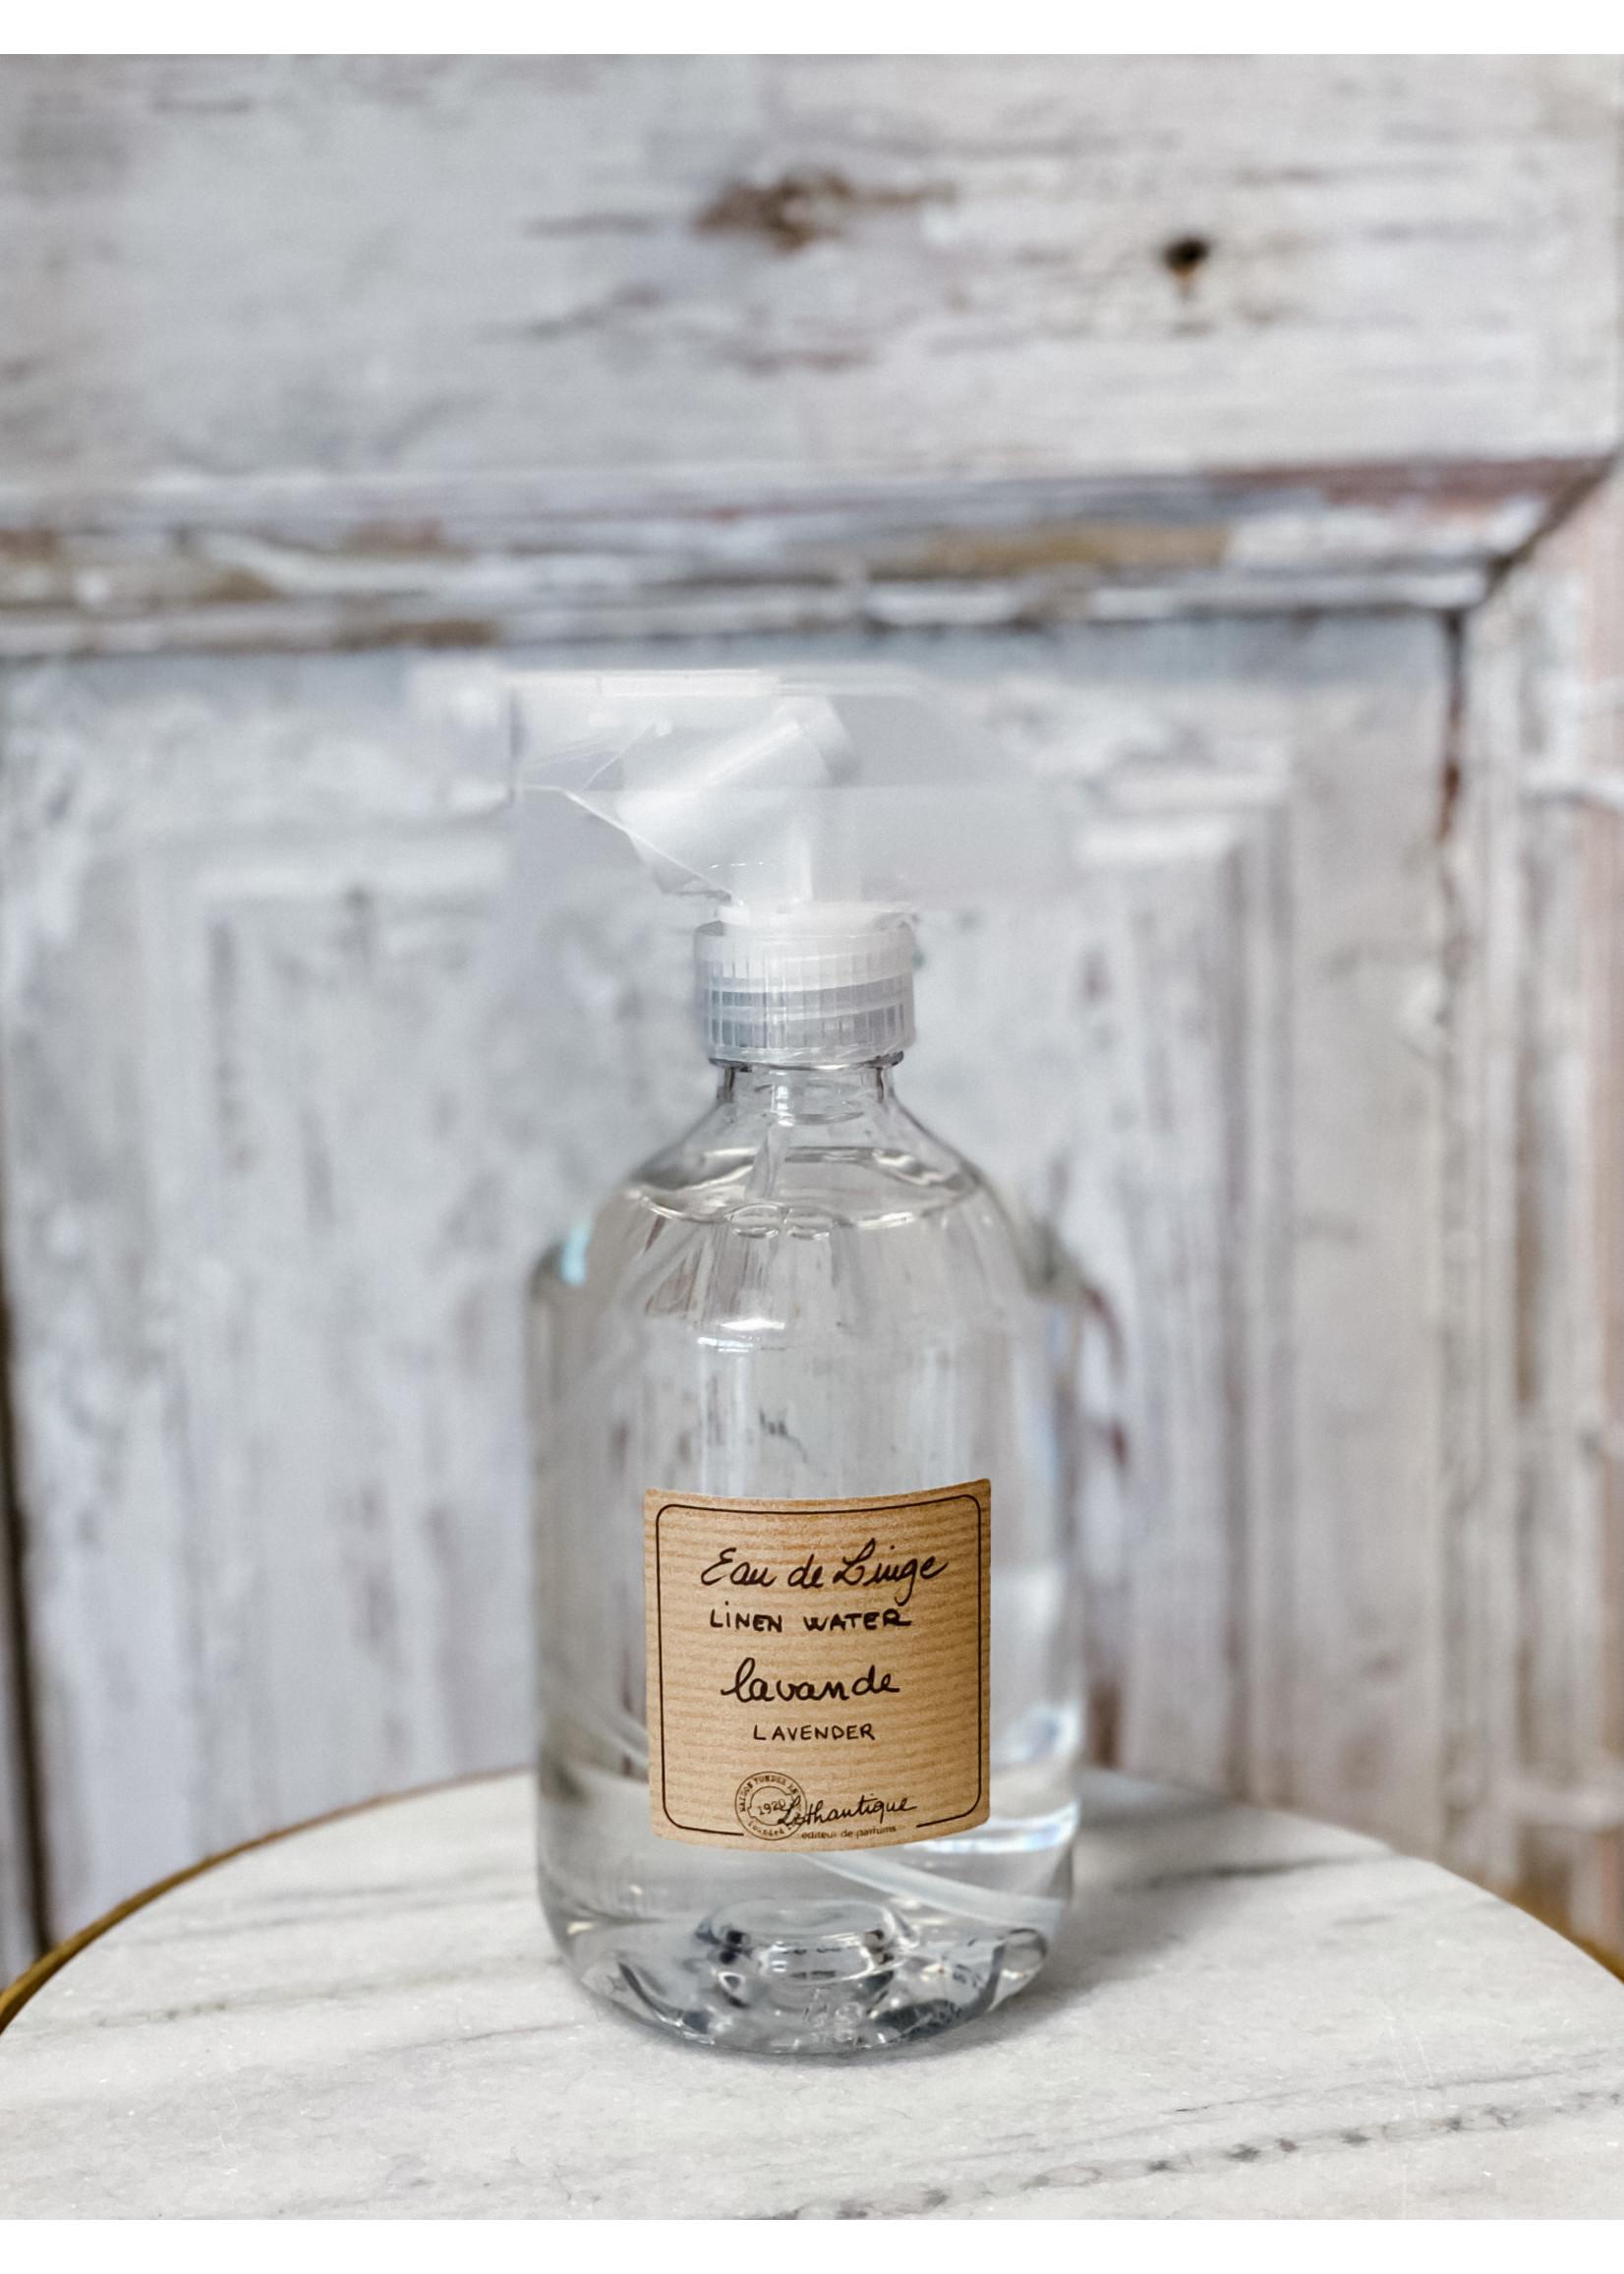 Linen Water - Lavender